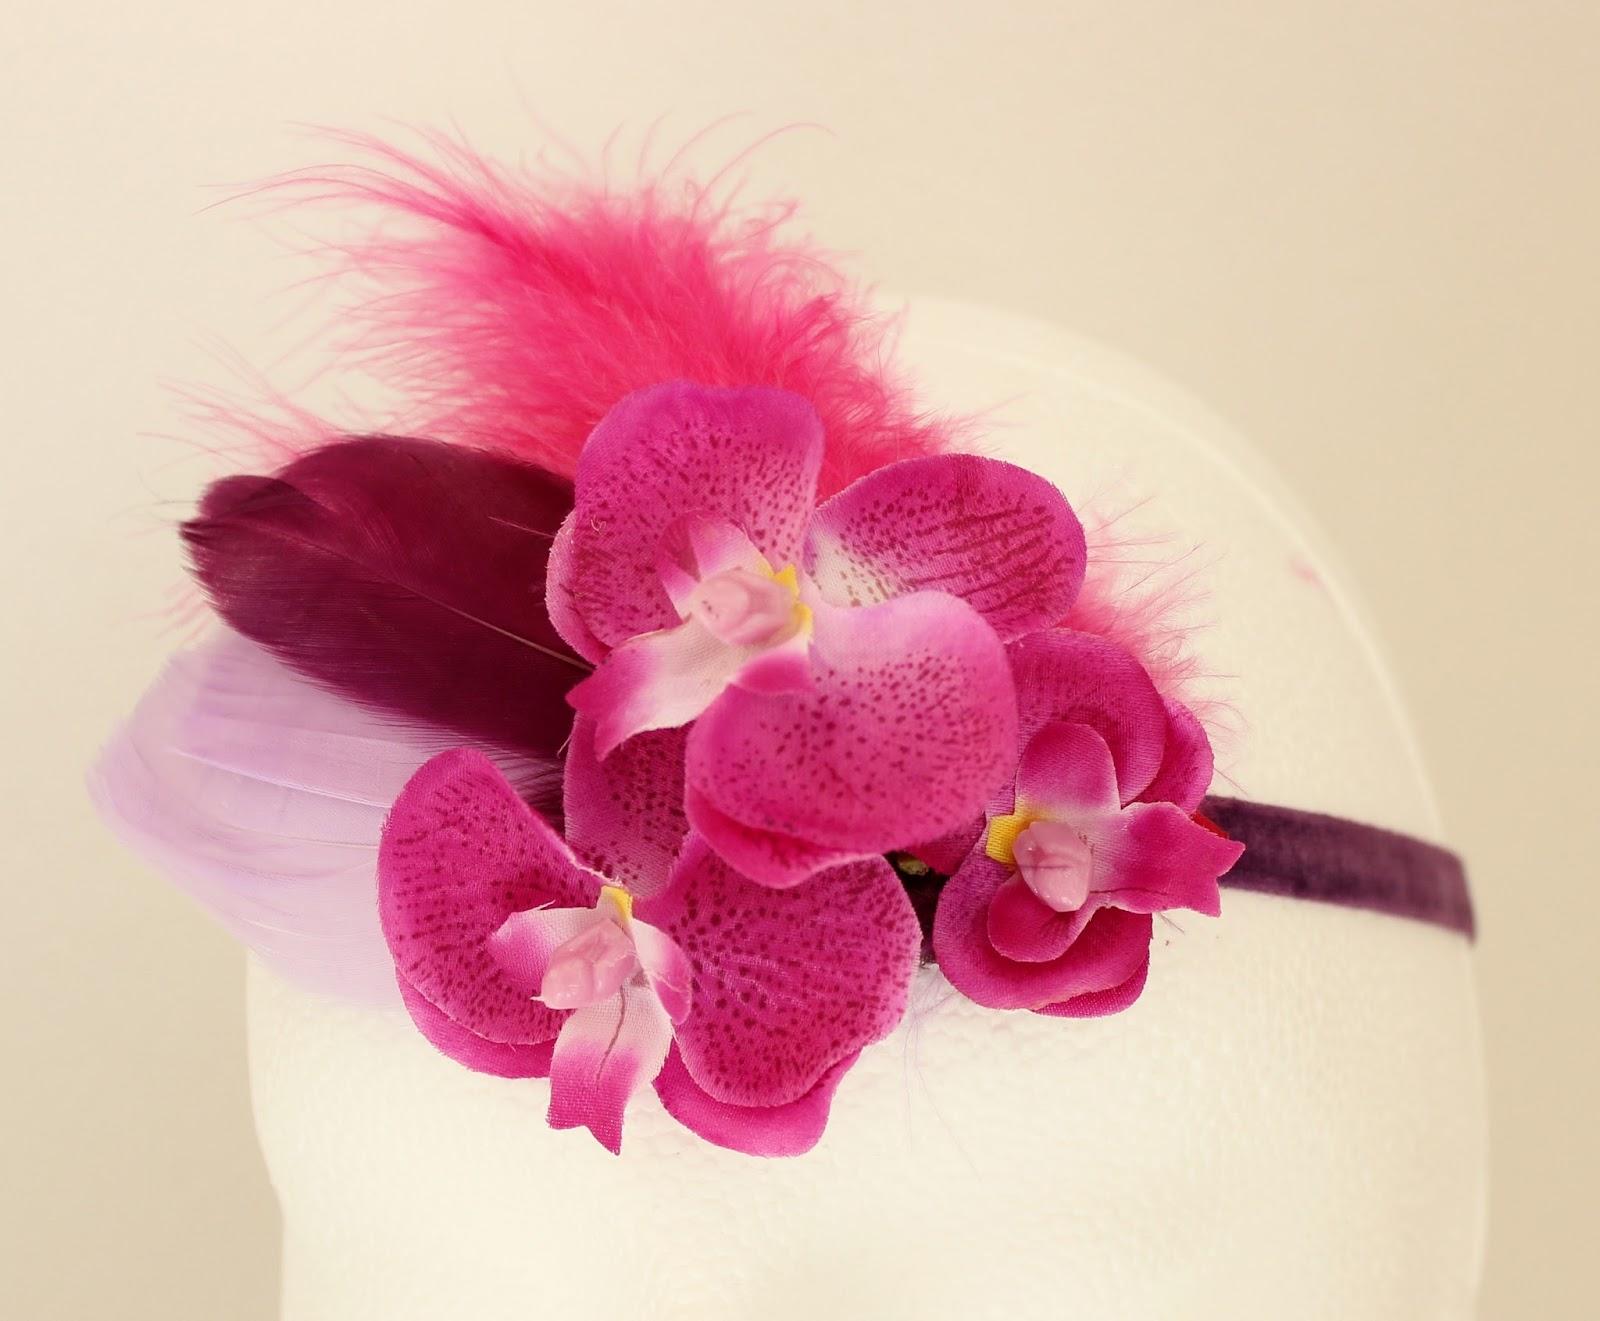 Colección Orquídea - Banda elástica estrecha fucsia